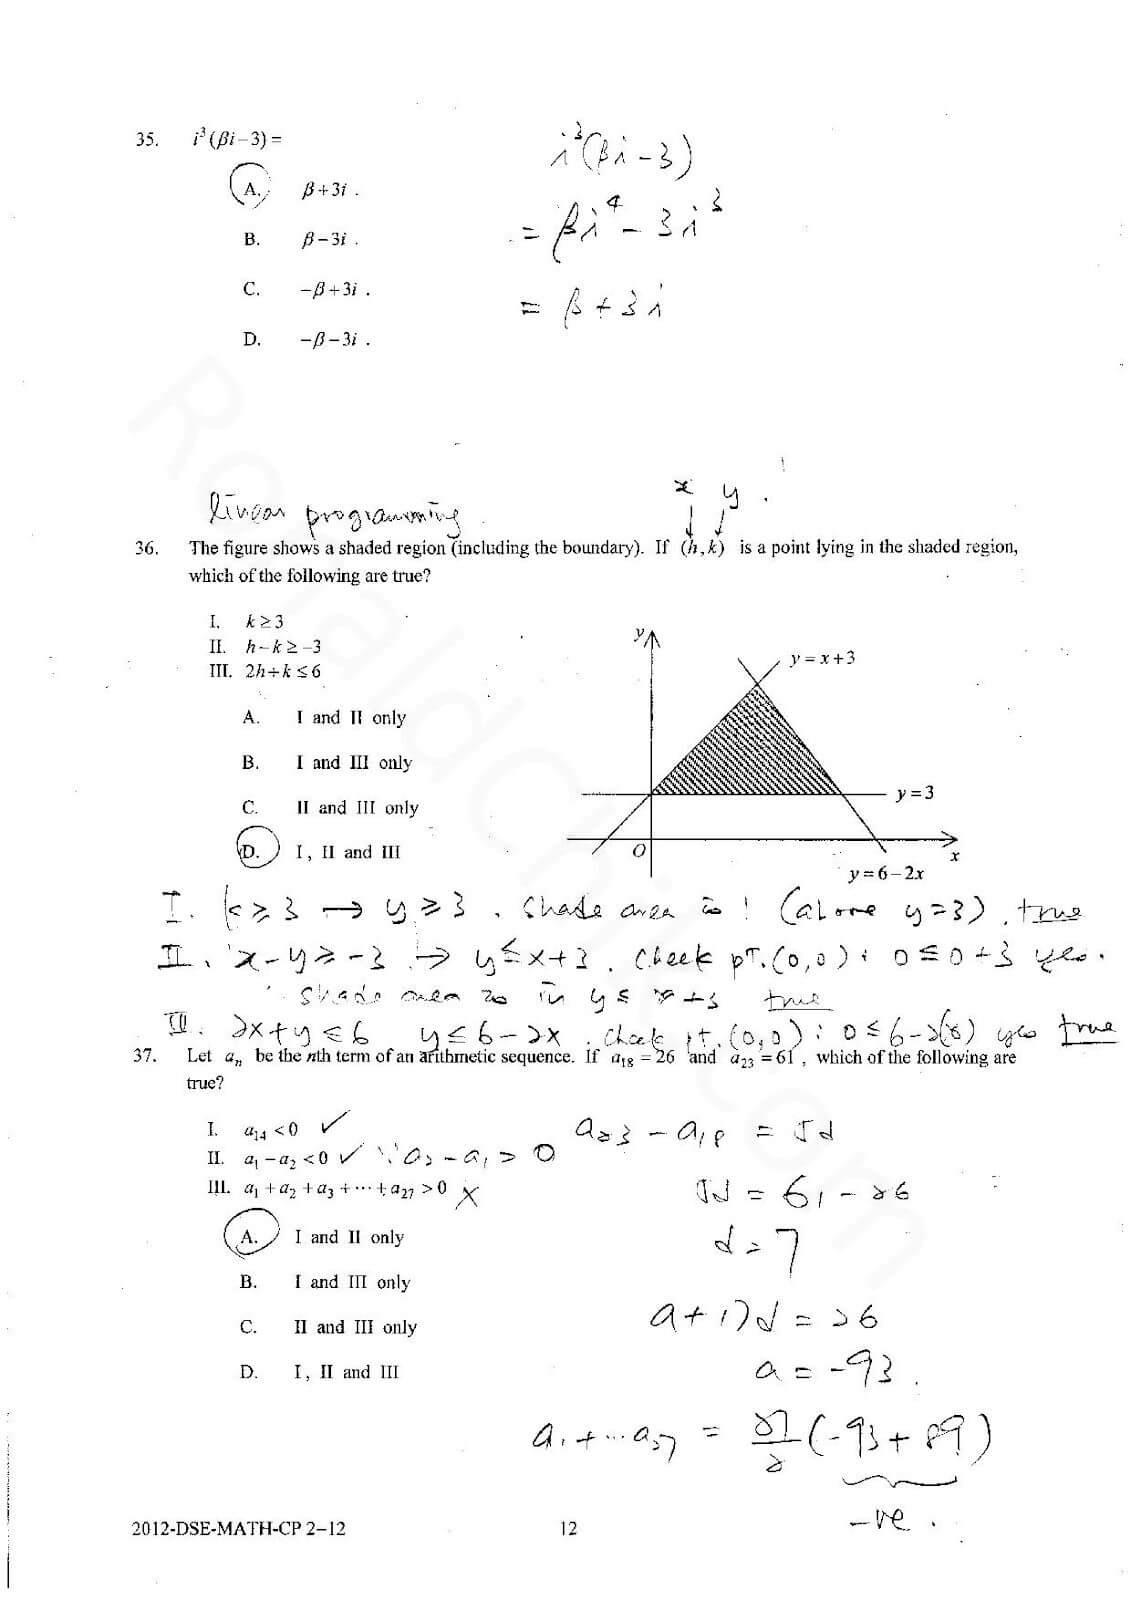 2012 DSE Math P2 卷二 Q35,36,37